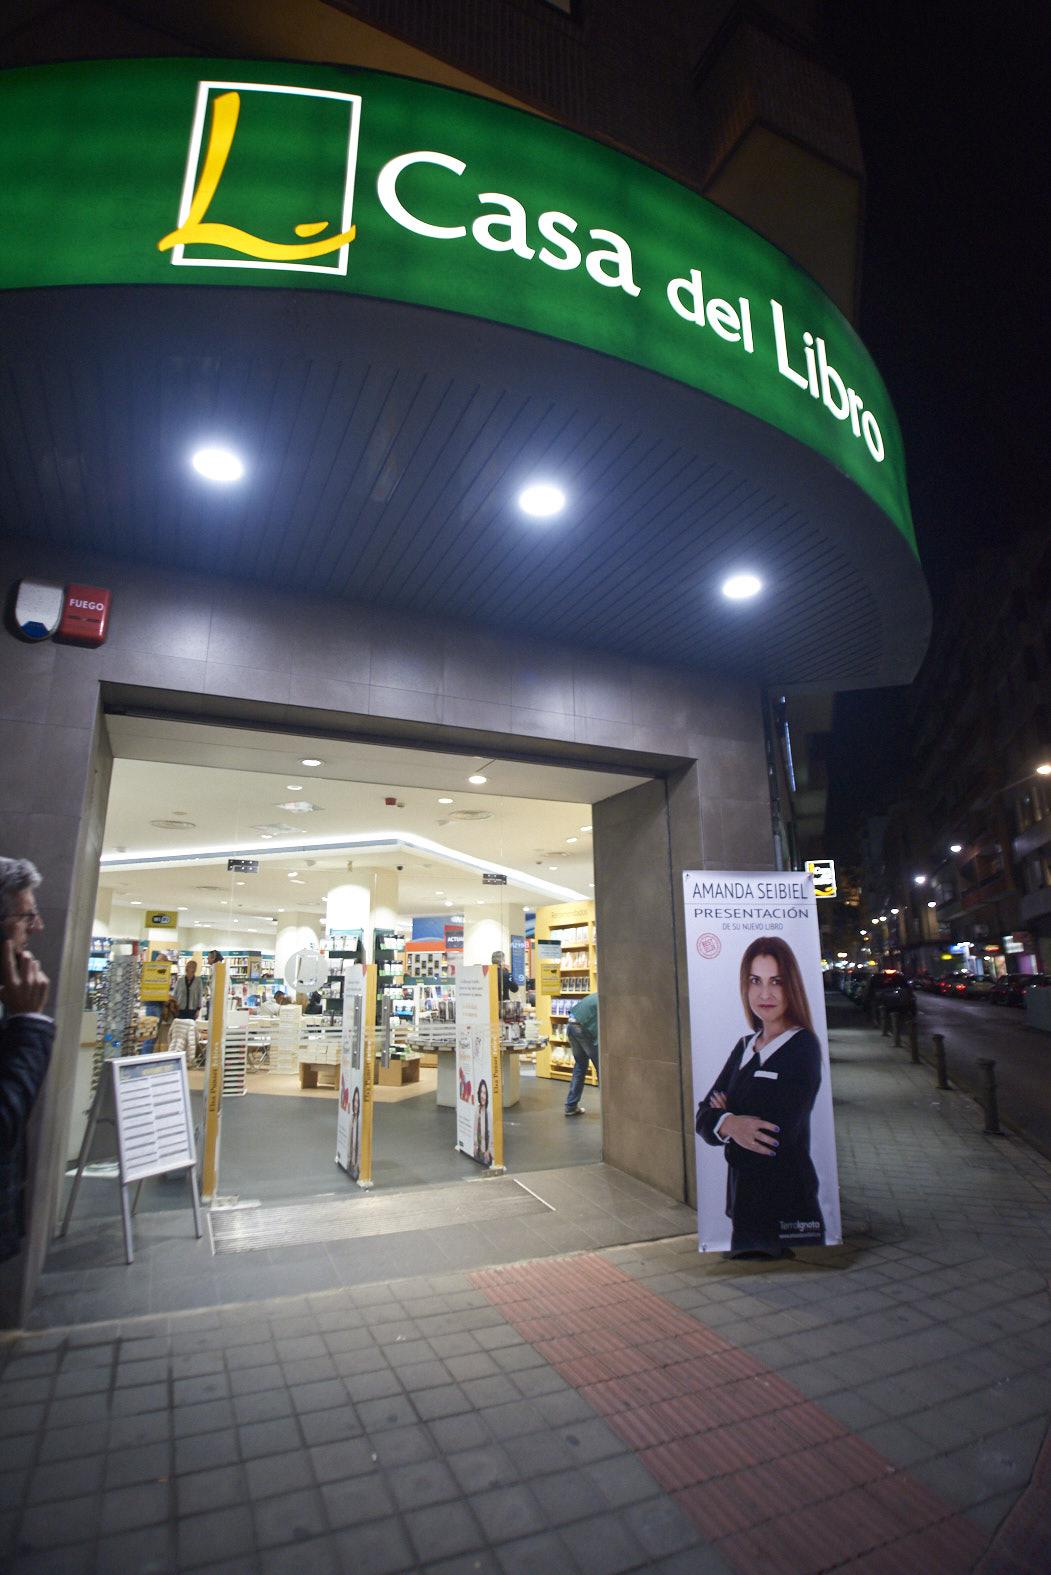 00-Publicar-un-libro-editar-Madrid-Barcelona-cataluña-españa-català-Andalucia-coedicion-autoedicion-amanda-seibiel-myr-garrido-casa-del-libro